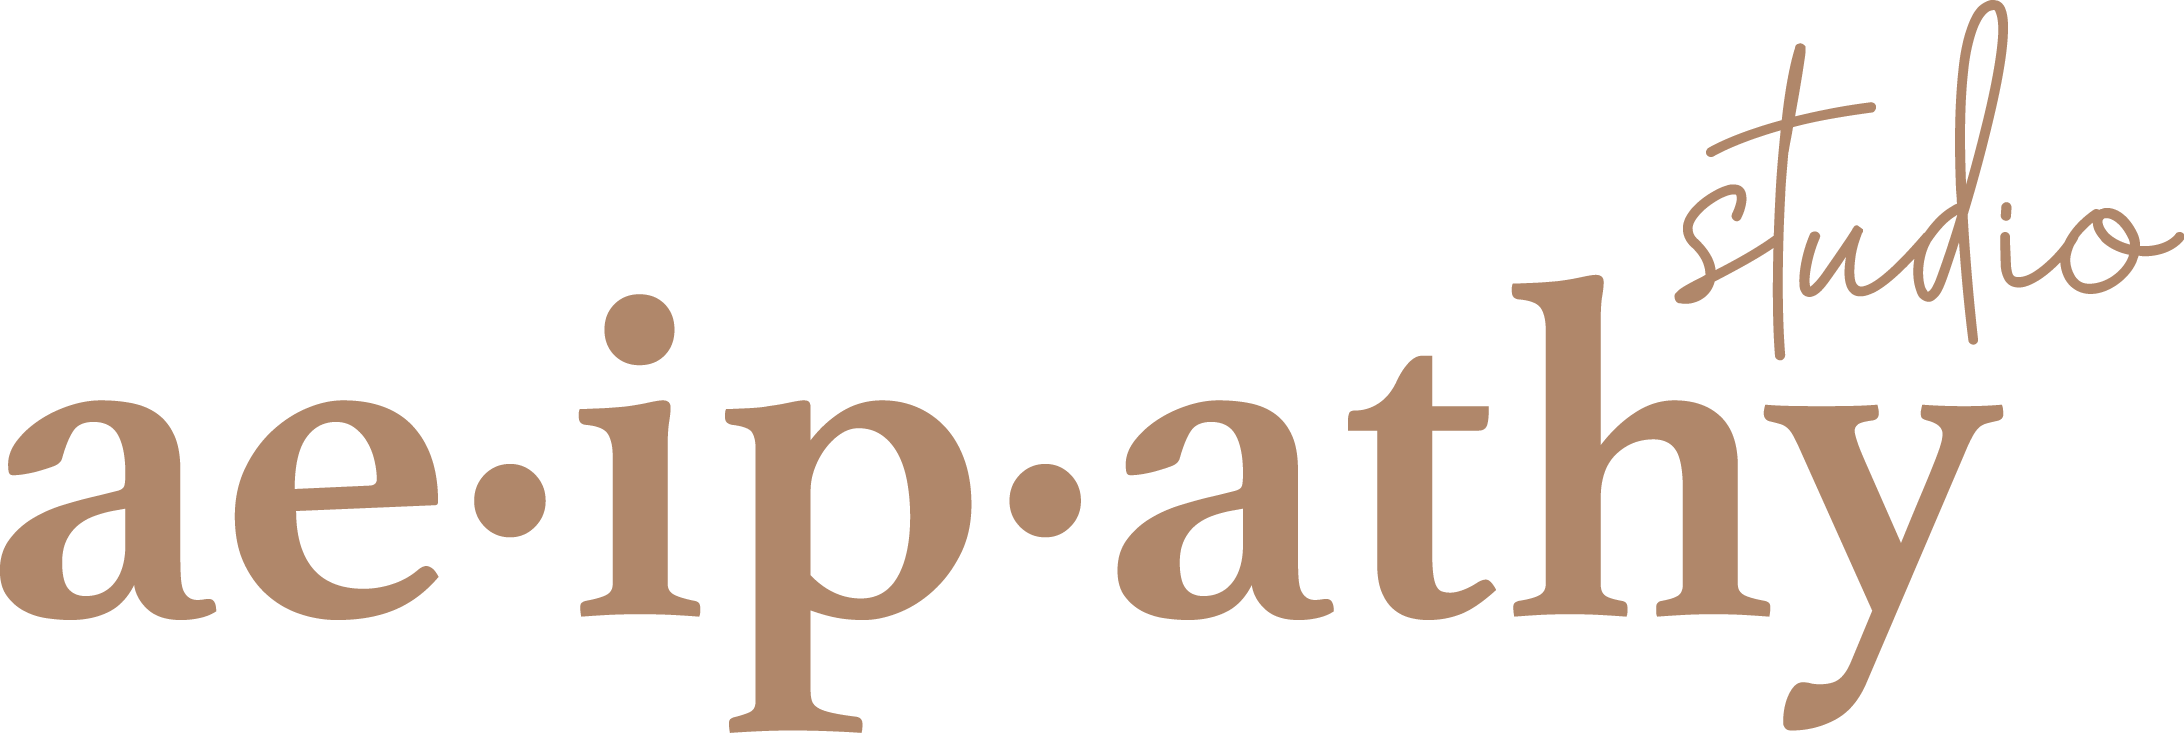 aeipathy studio logo .png